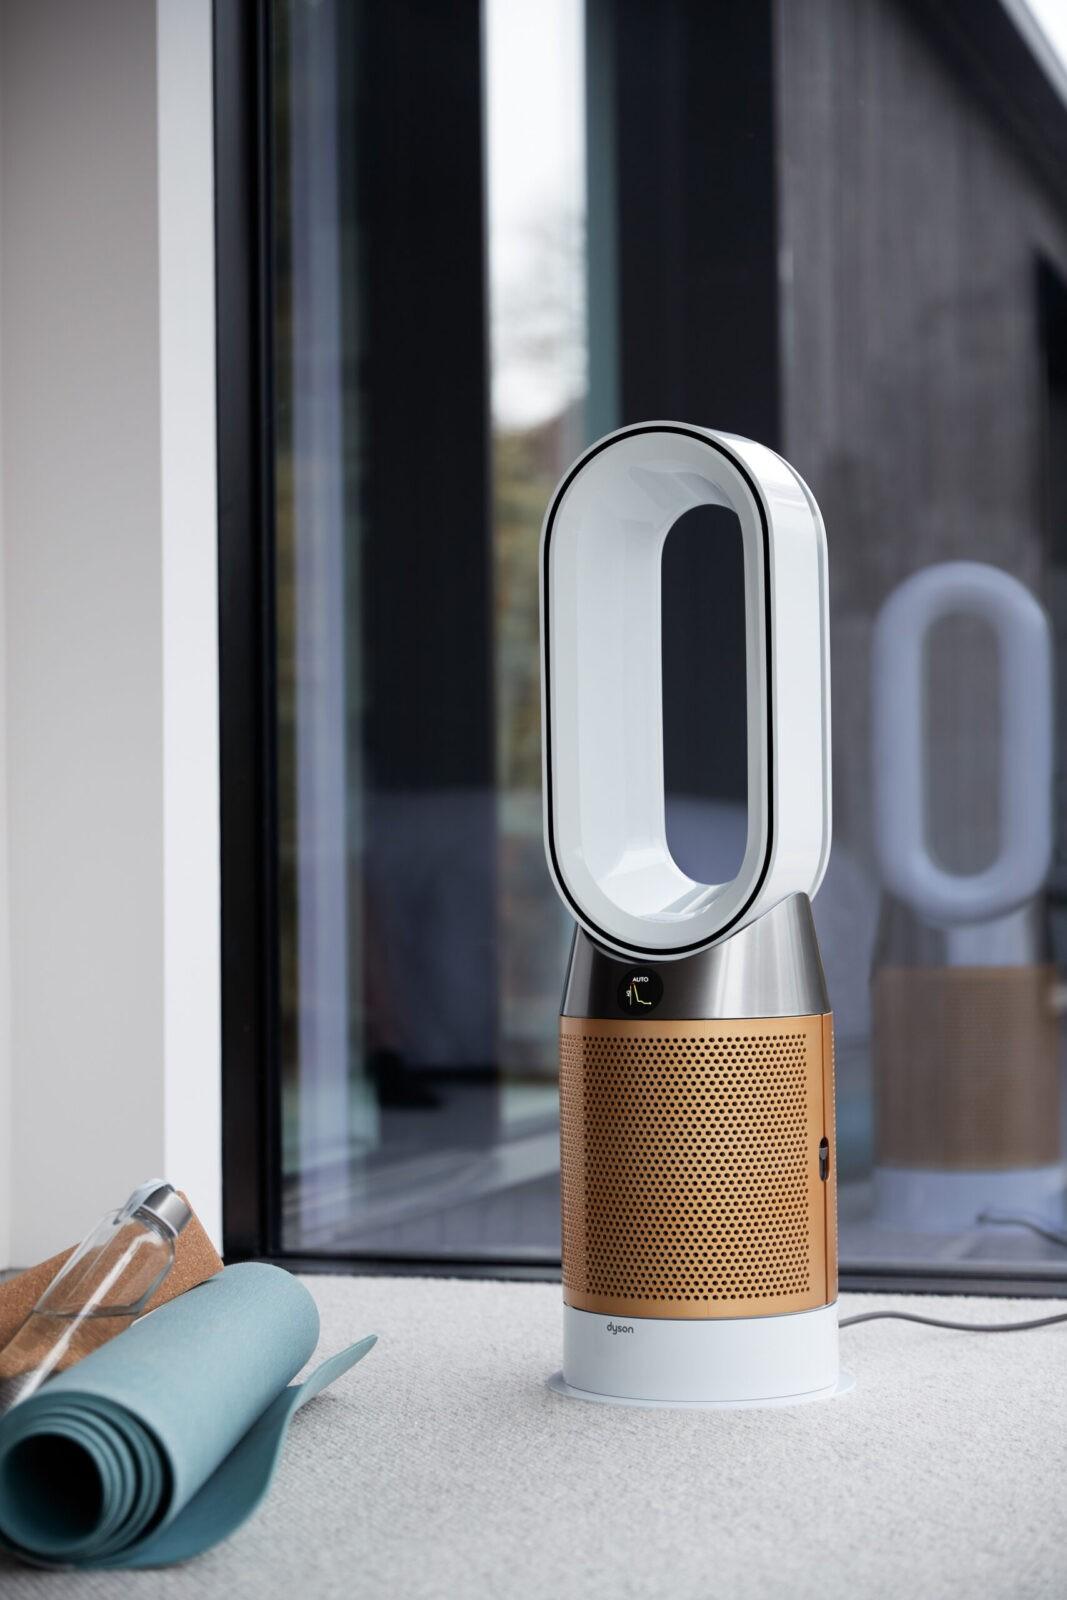 Dyson выпустил новый очиститель воздуха Dyson HP08 (ec yoga editorial imagery q1 2021 hp06 2 1 scaled)